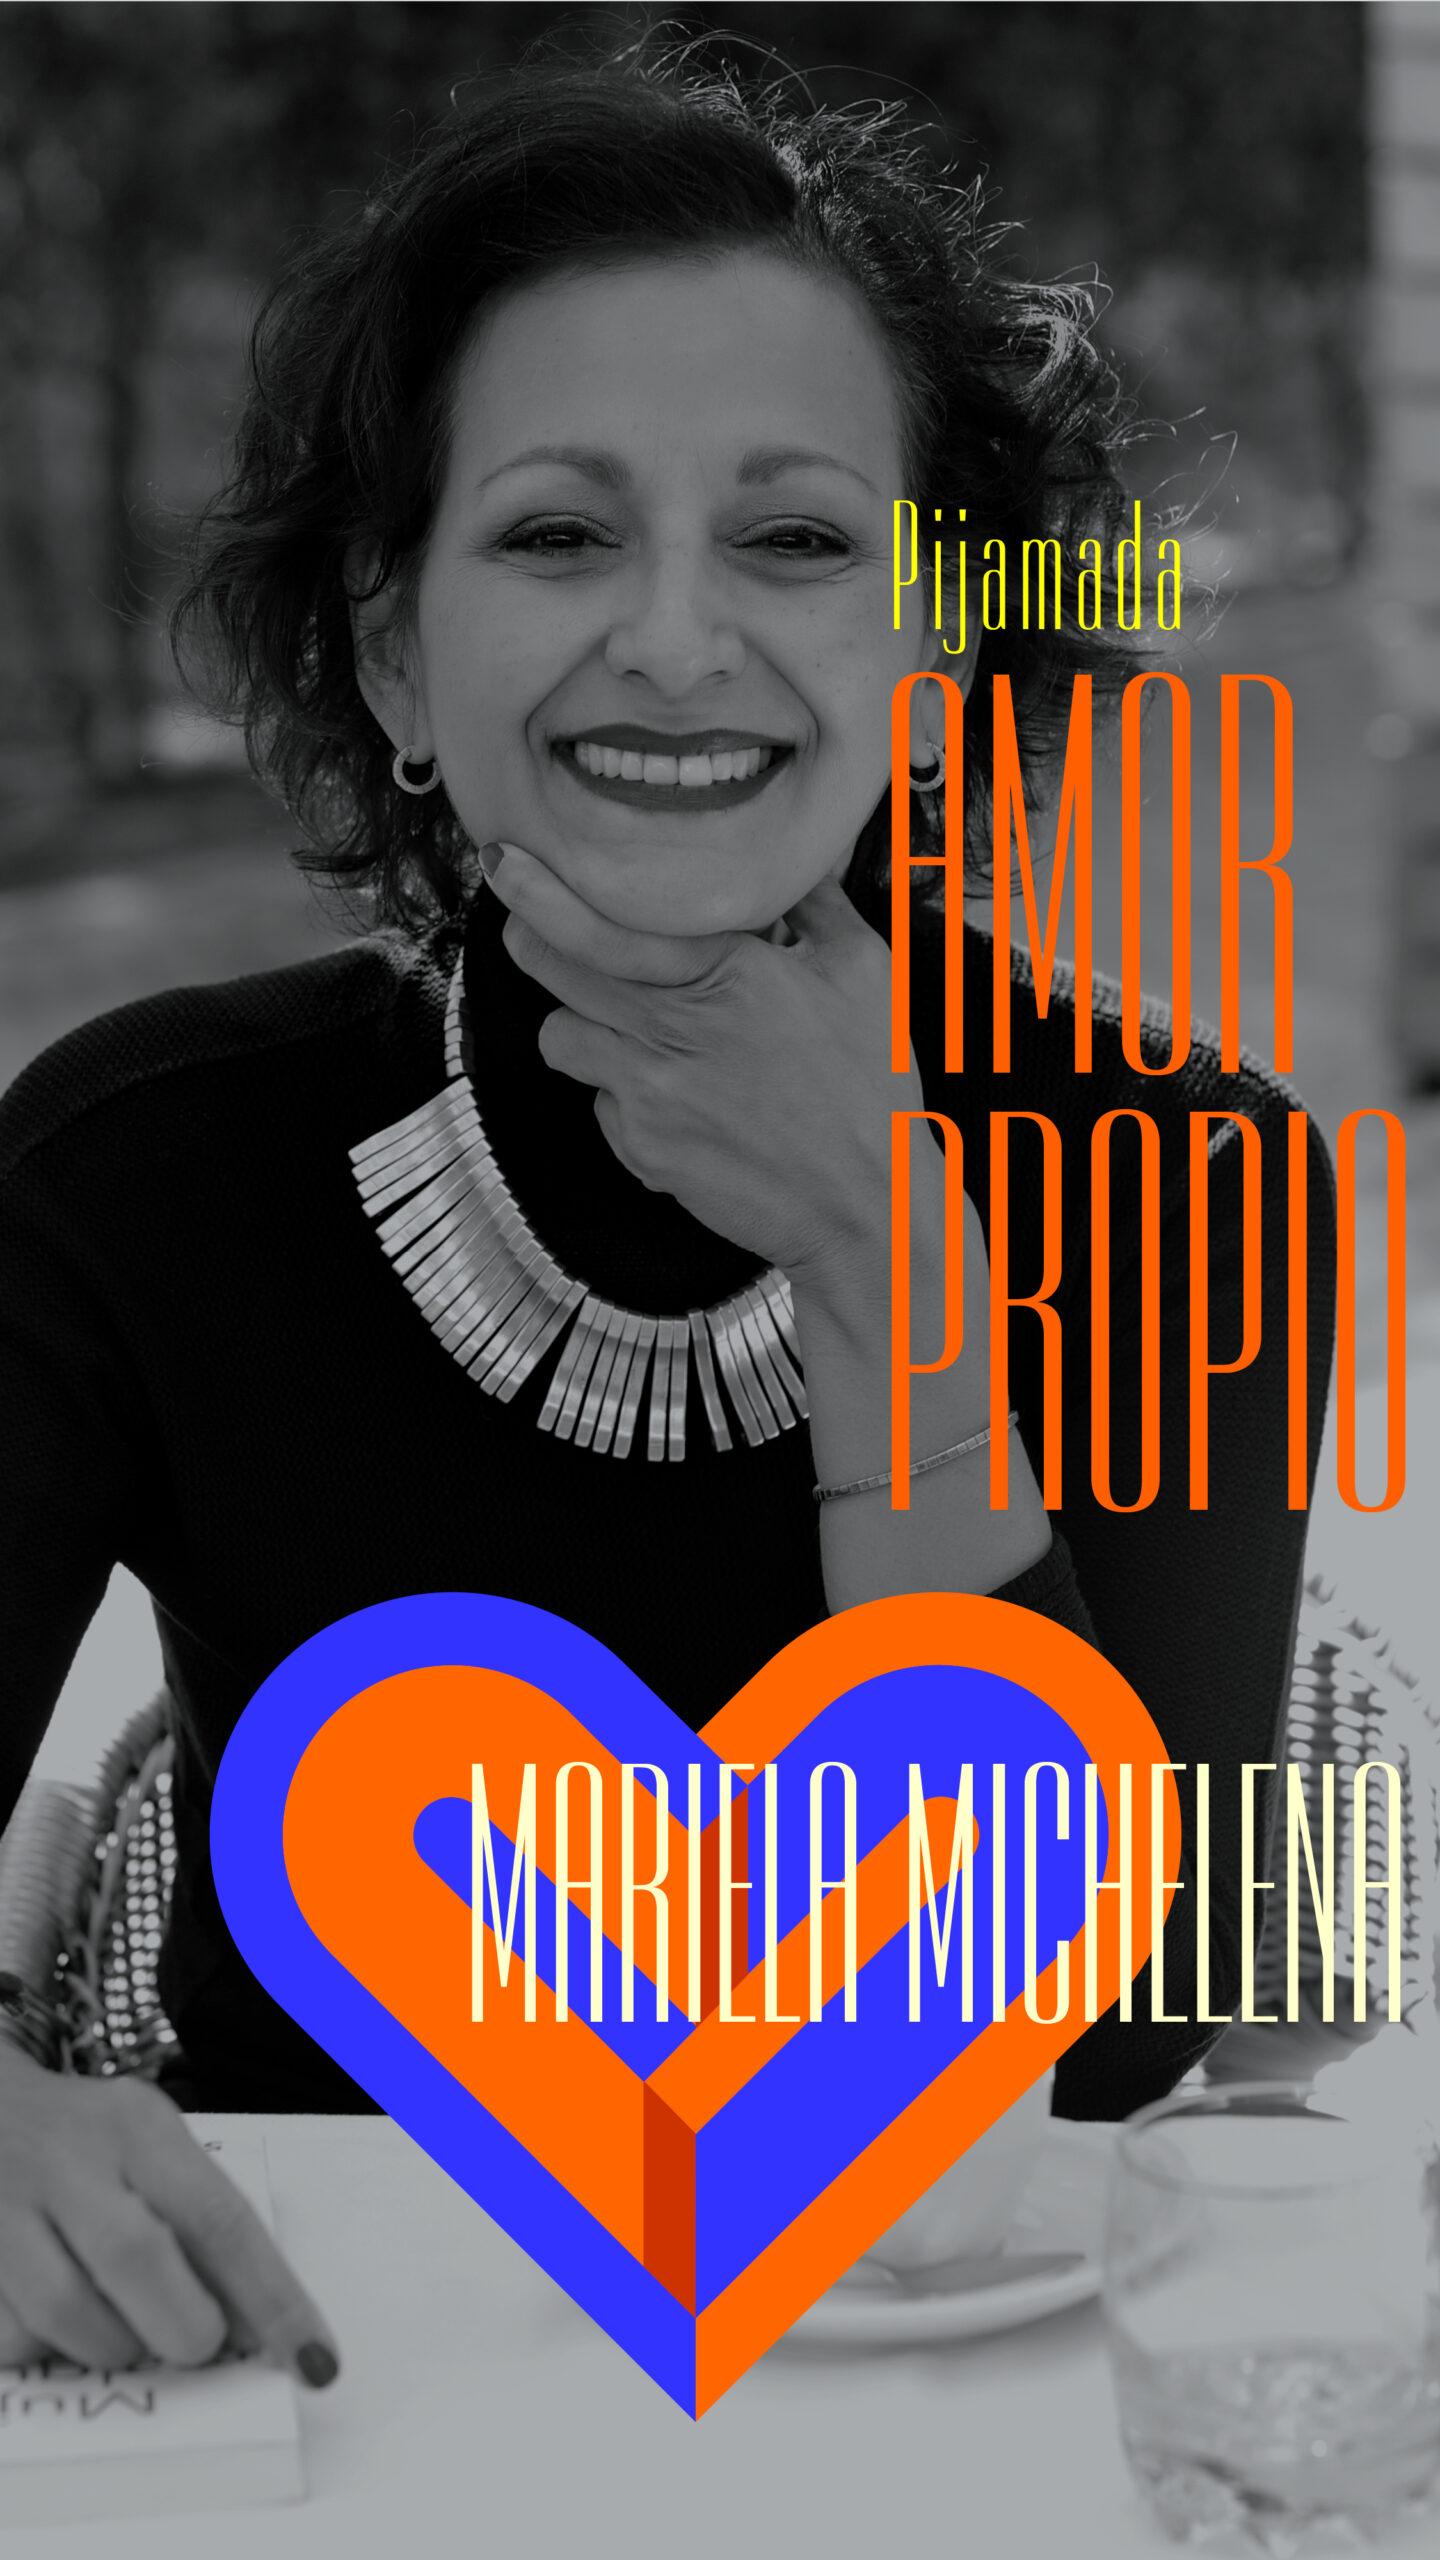 Amor Propio HISTORIAS 2020 Mariela Michelena para WEB20